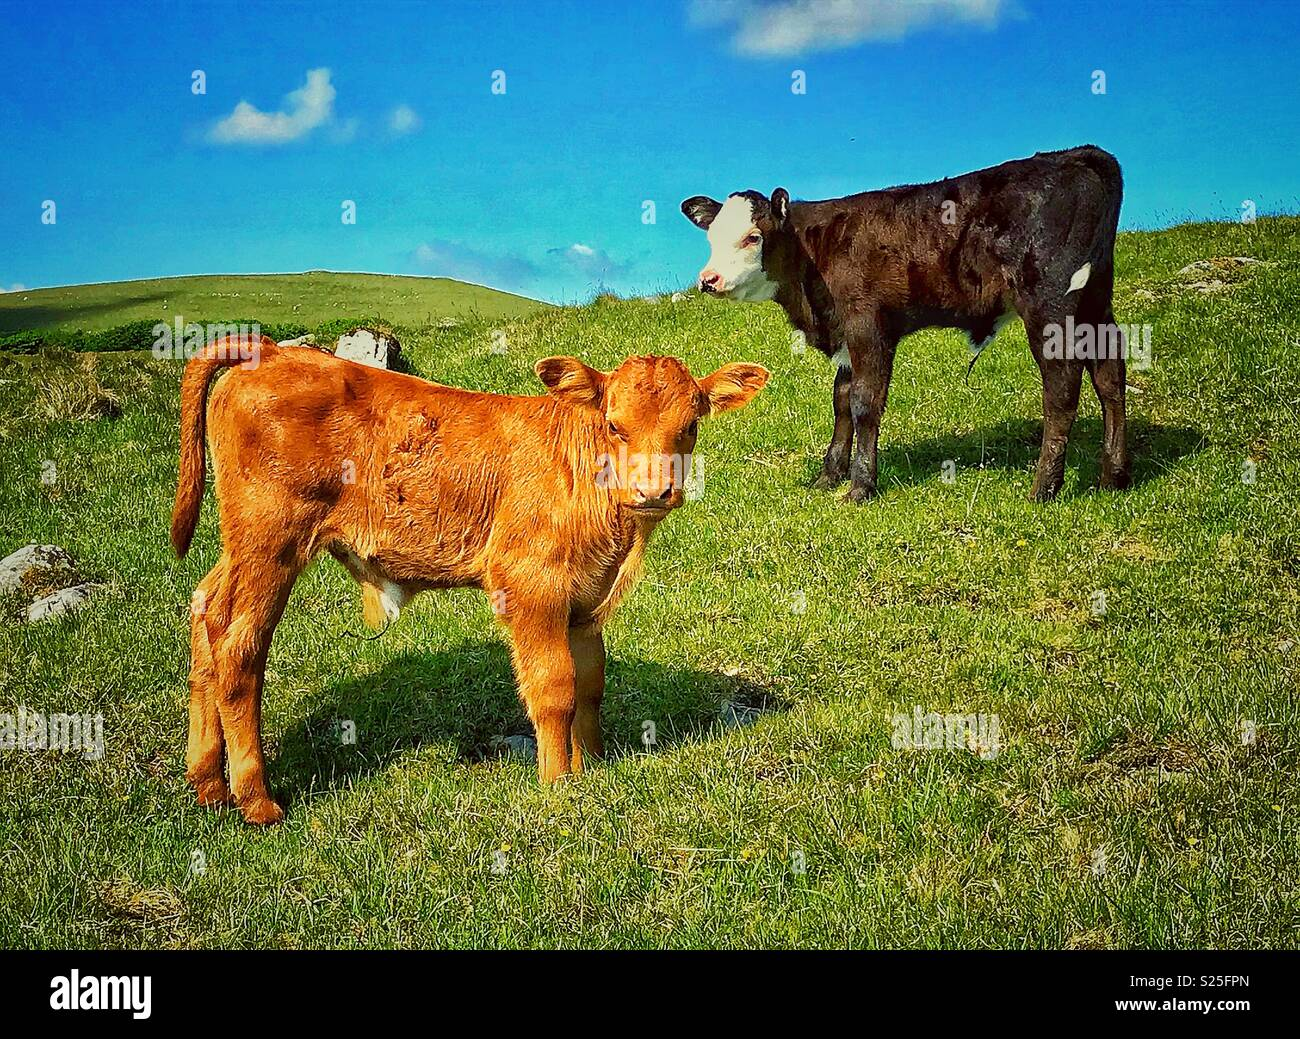 Curioso mucche Immagini Stock